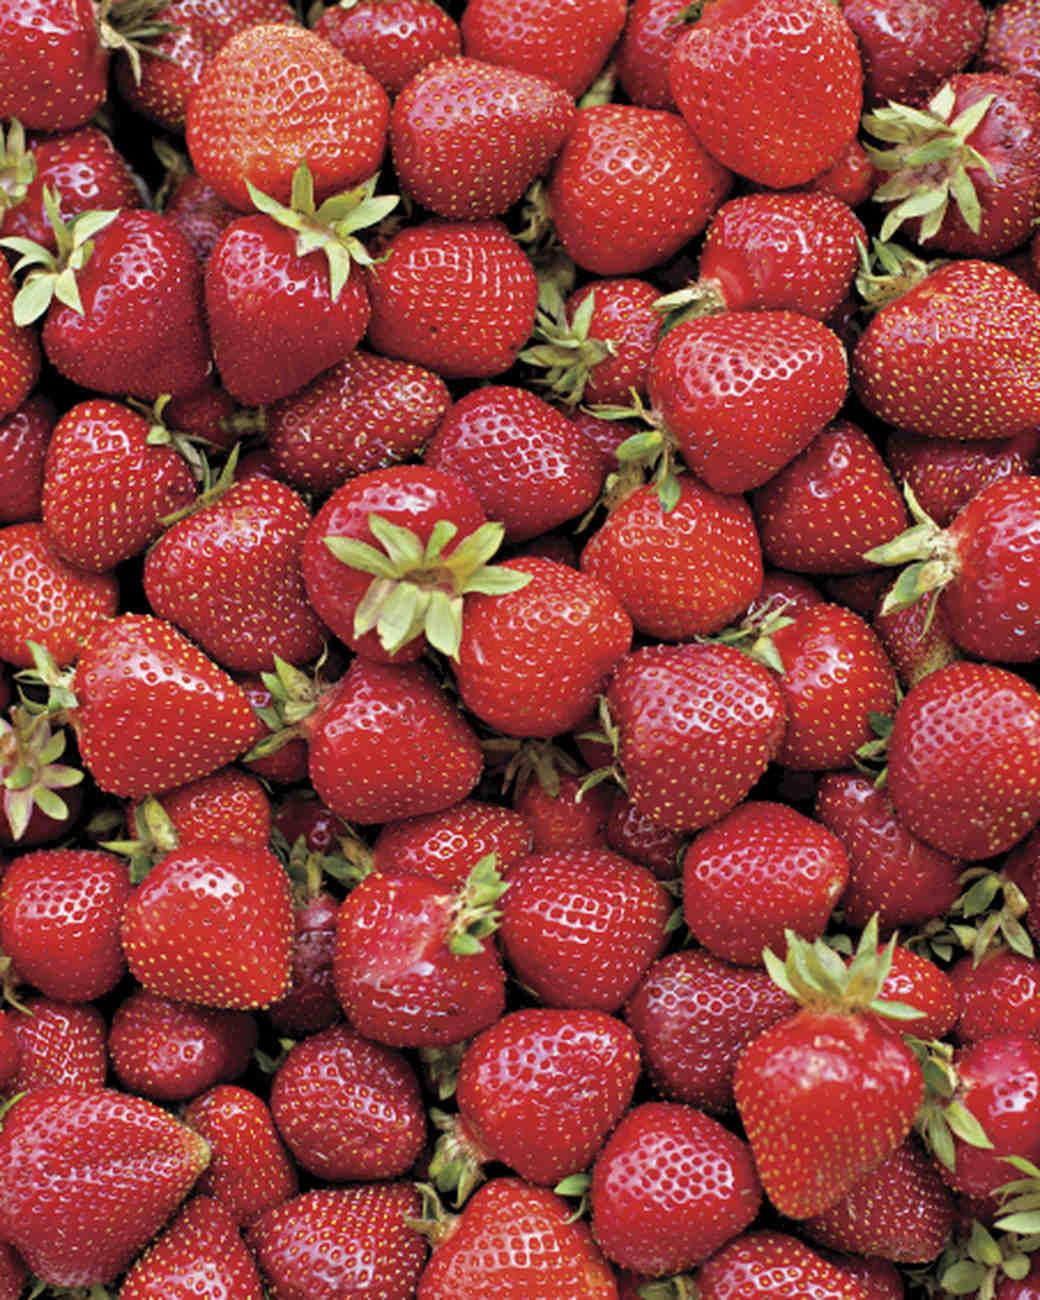 progress-report-strawberries-ms108726.jpg